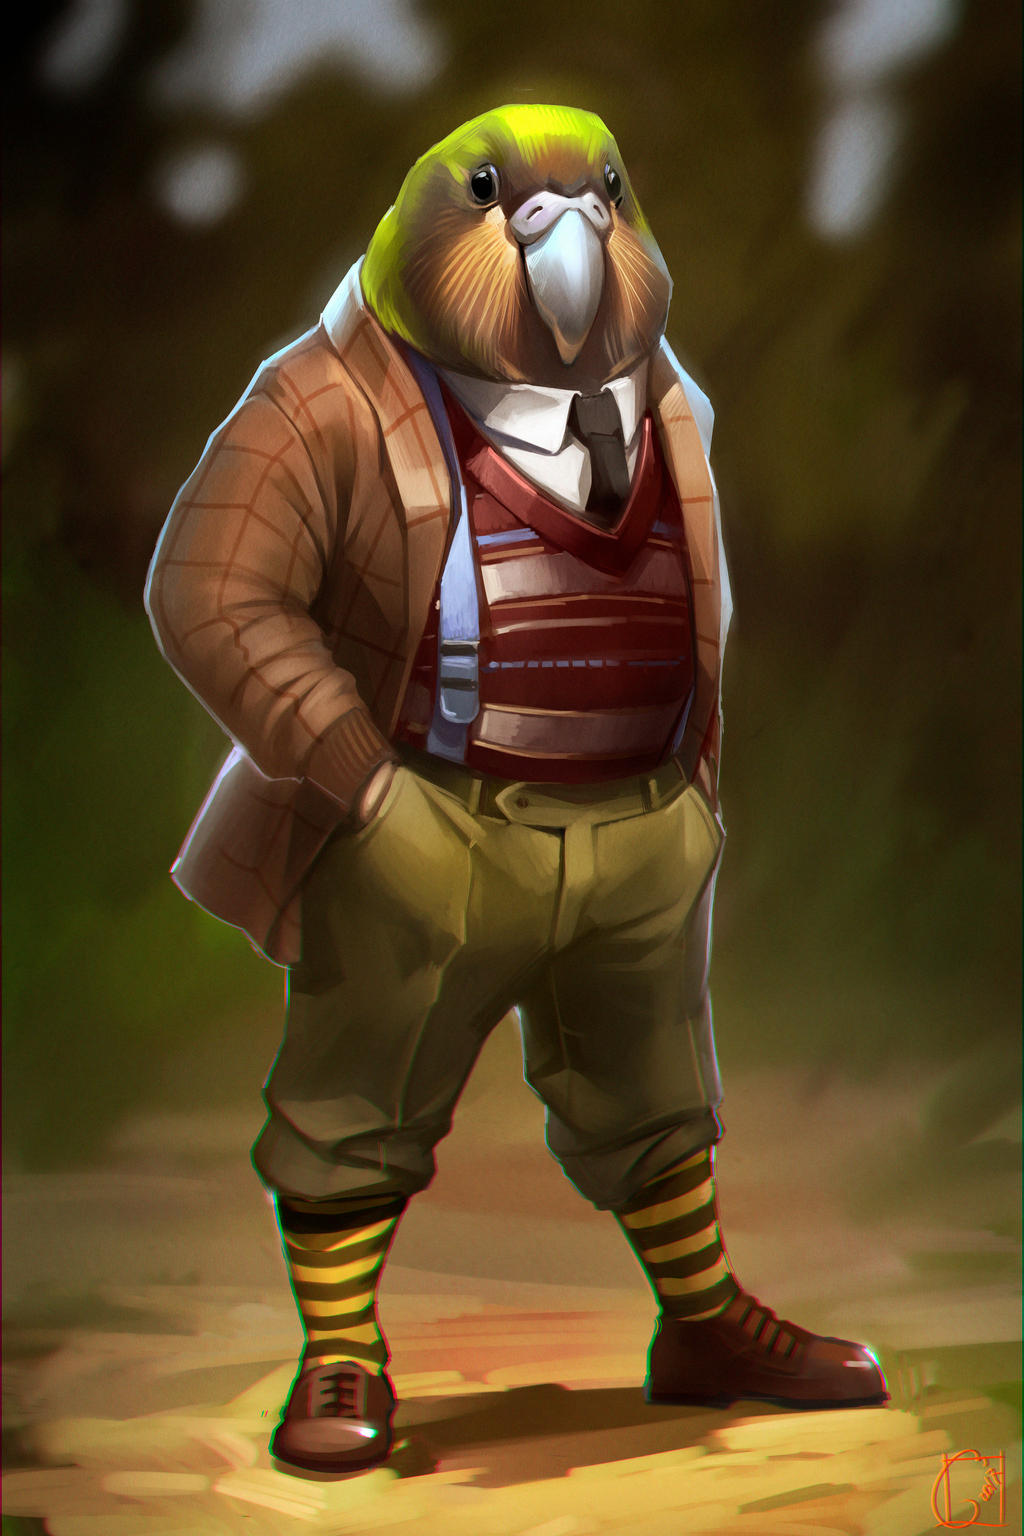 kakapo parrot by GaudiBuendia on DeviantArt